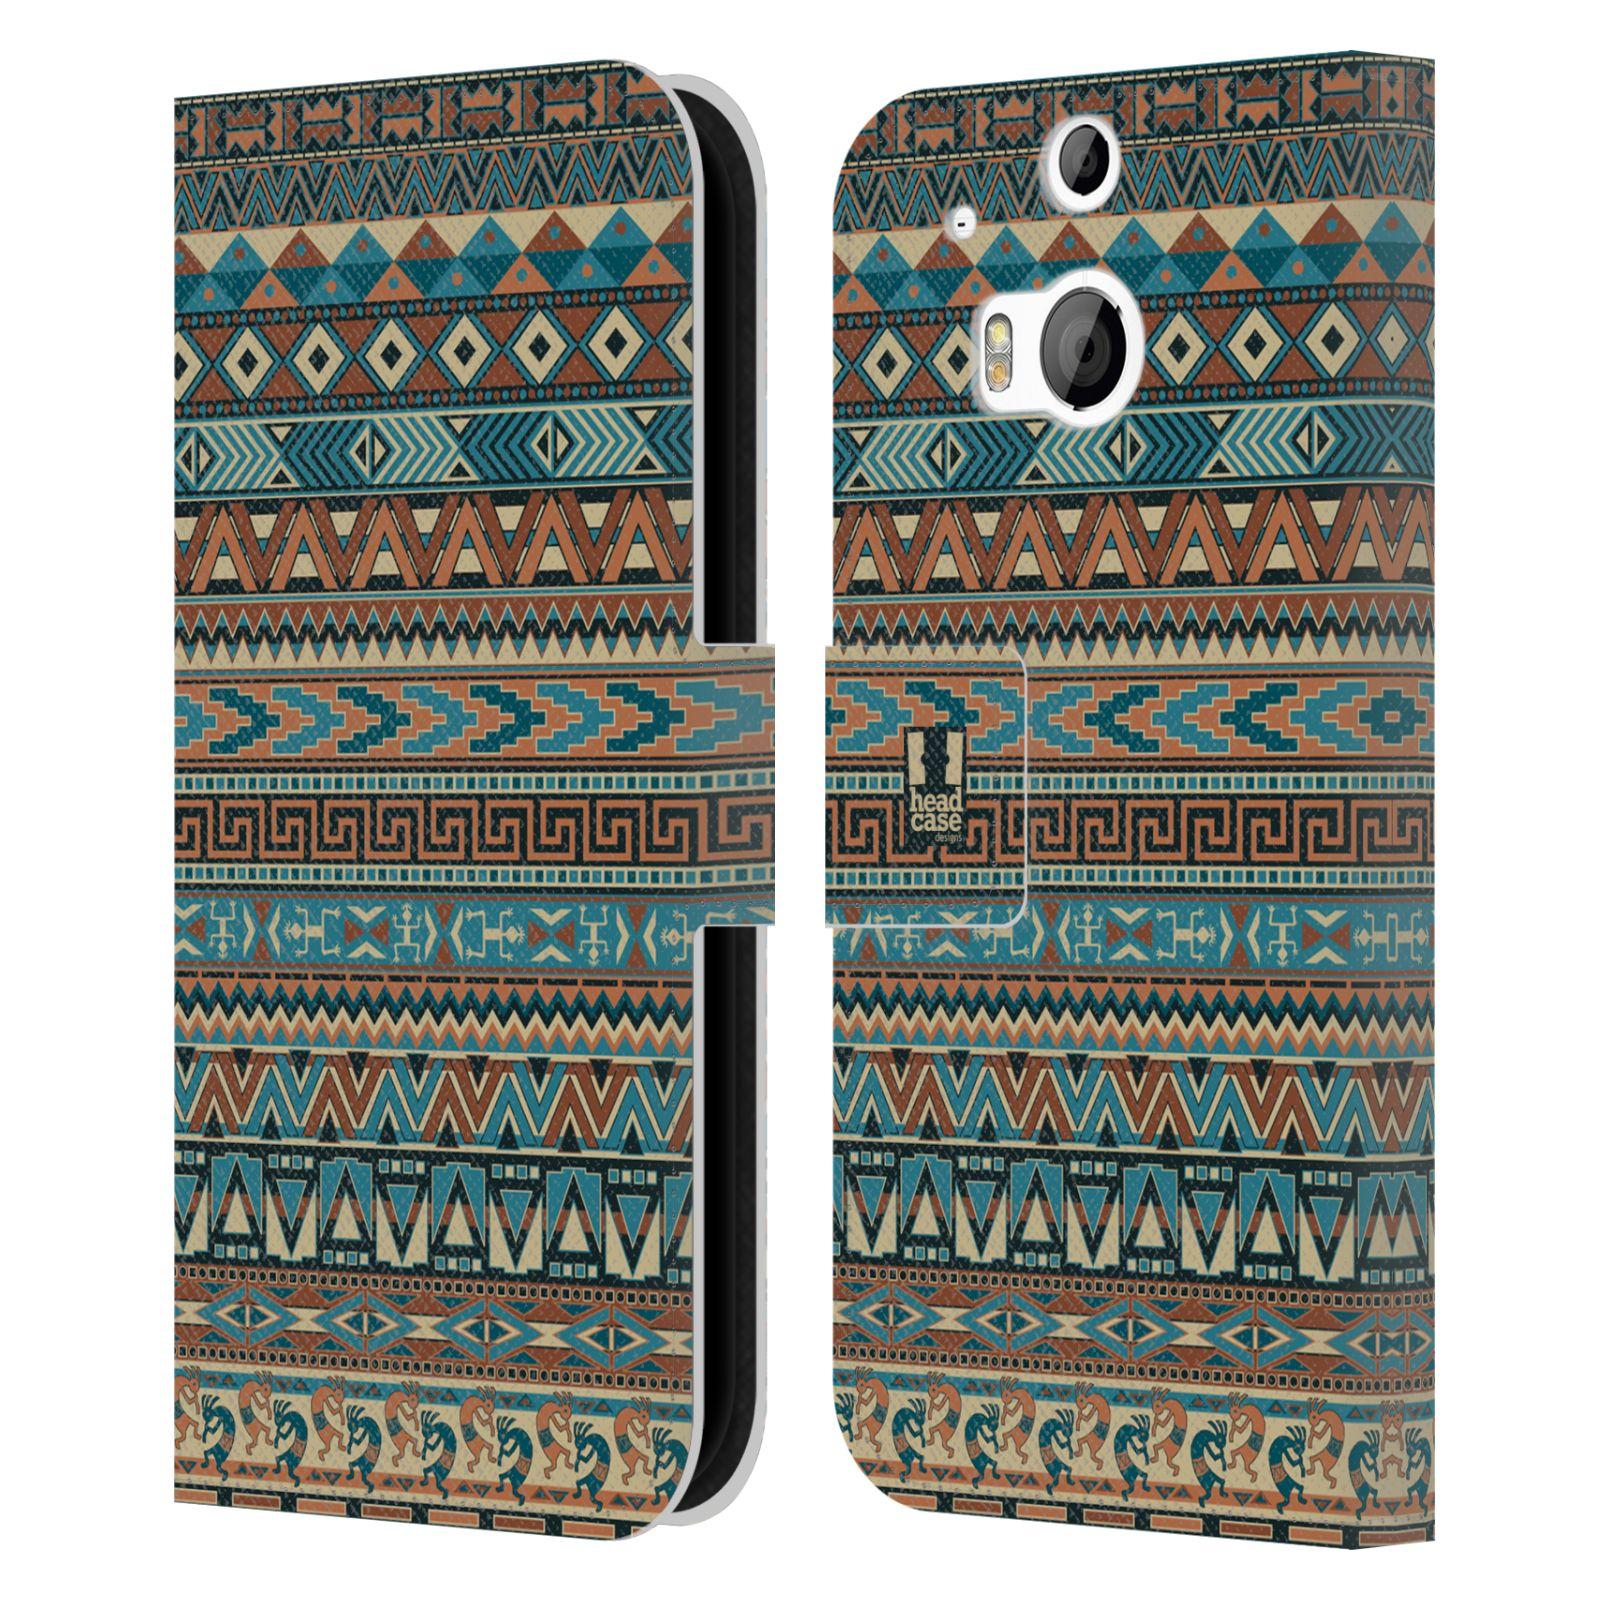 HEAD CASE Flipové pouzdro pro mobil HTC ONE (M8, M8s) Indiánský vzor BLUE modrá